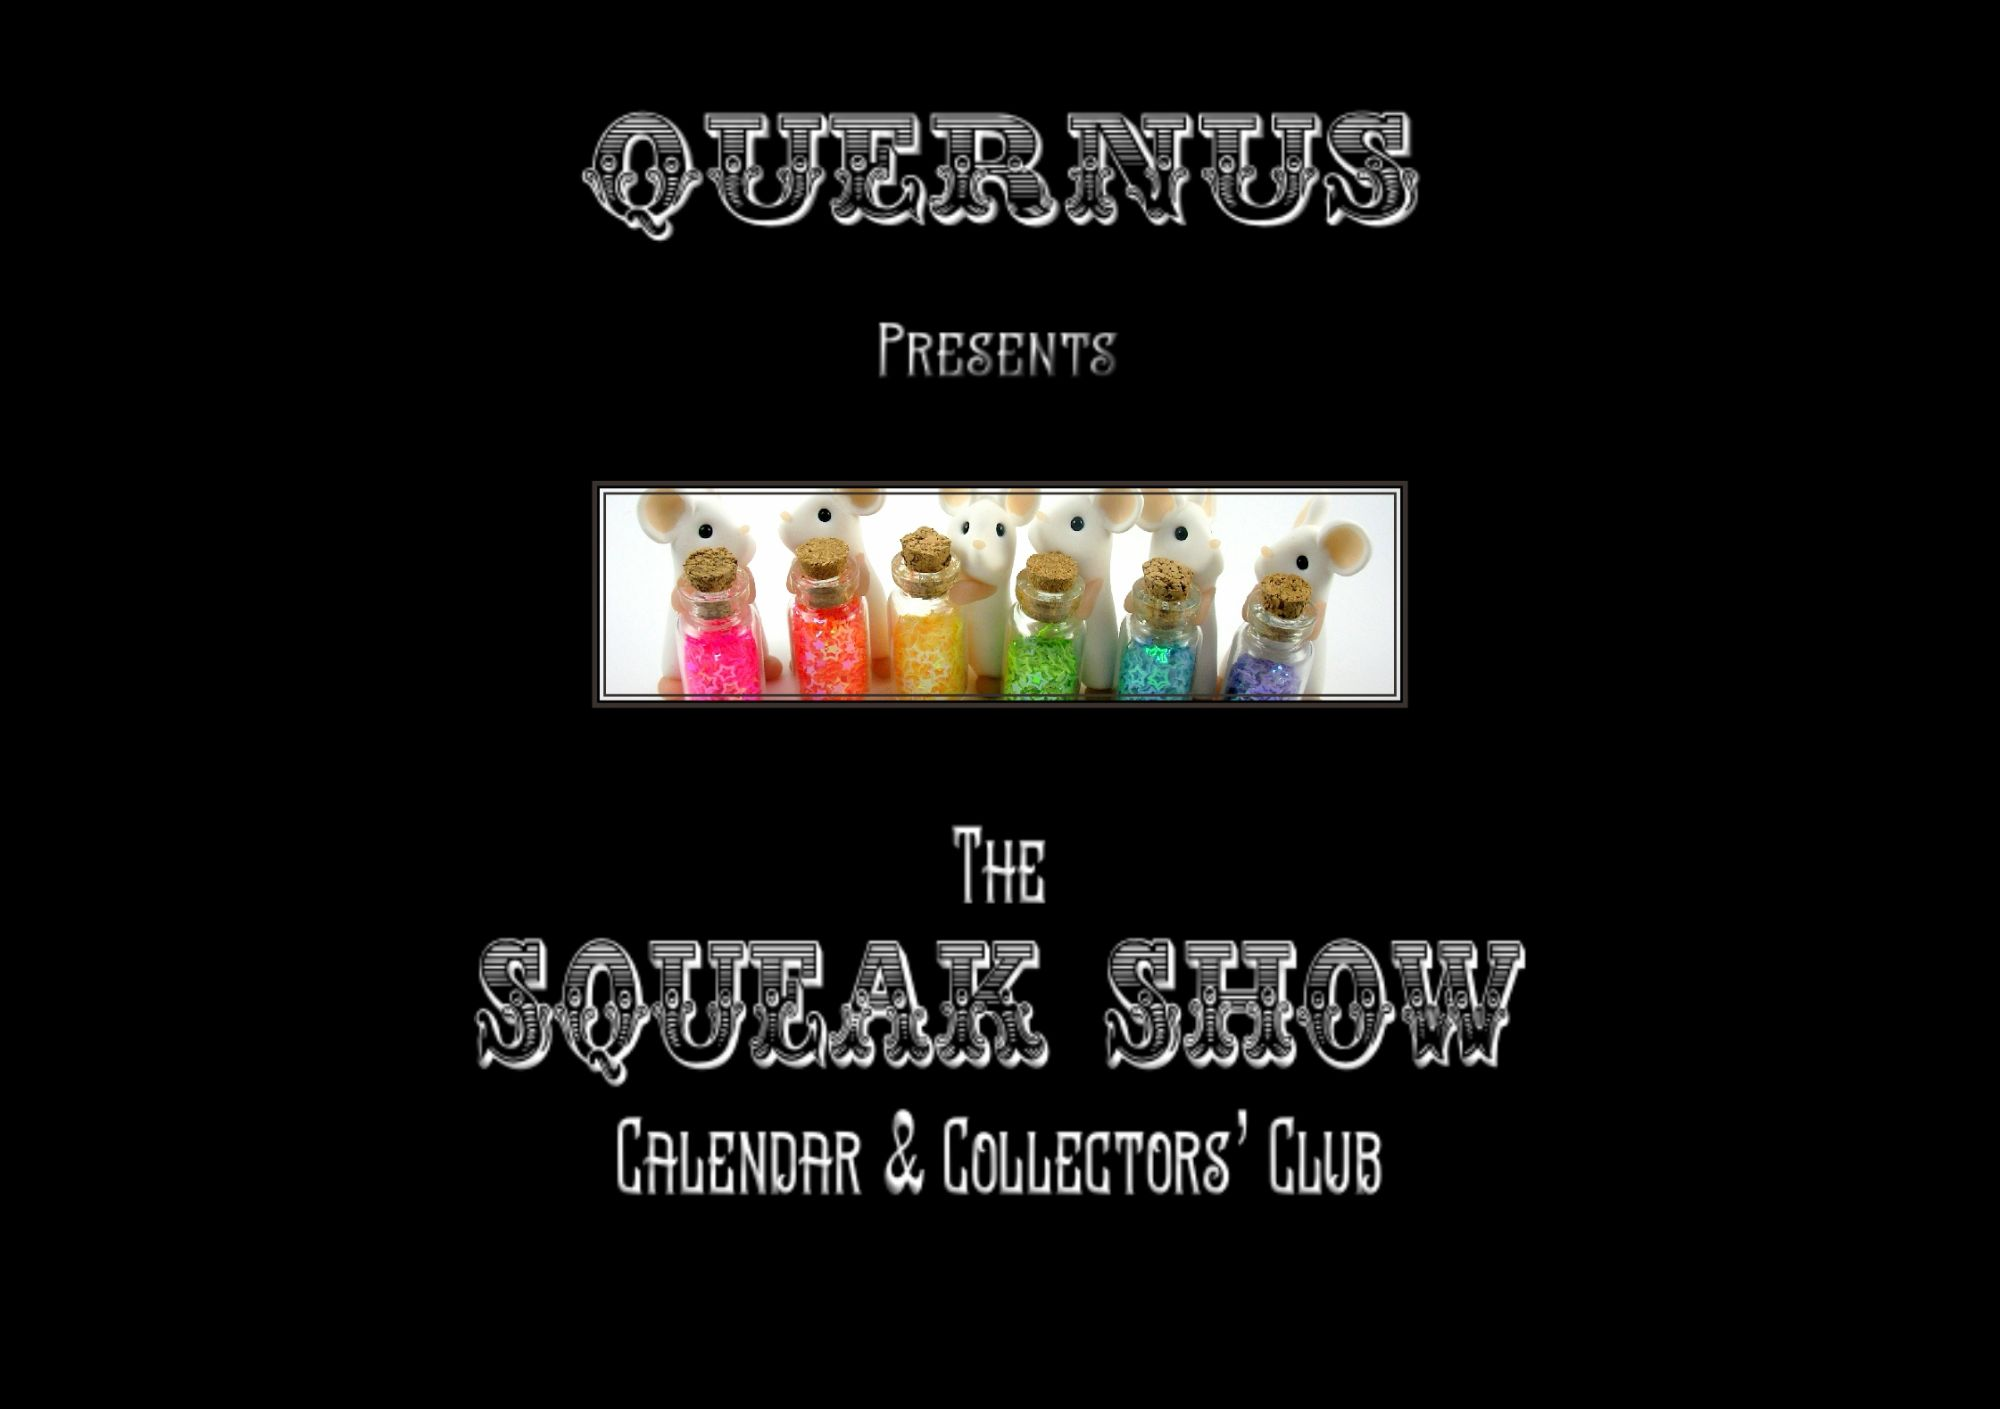 Quernus Squeak Show Calendar & Collectors' Club